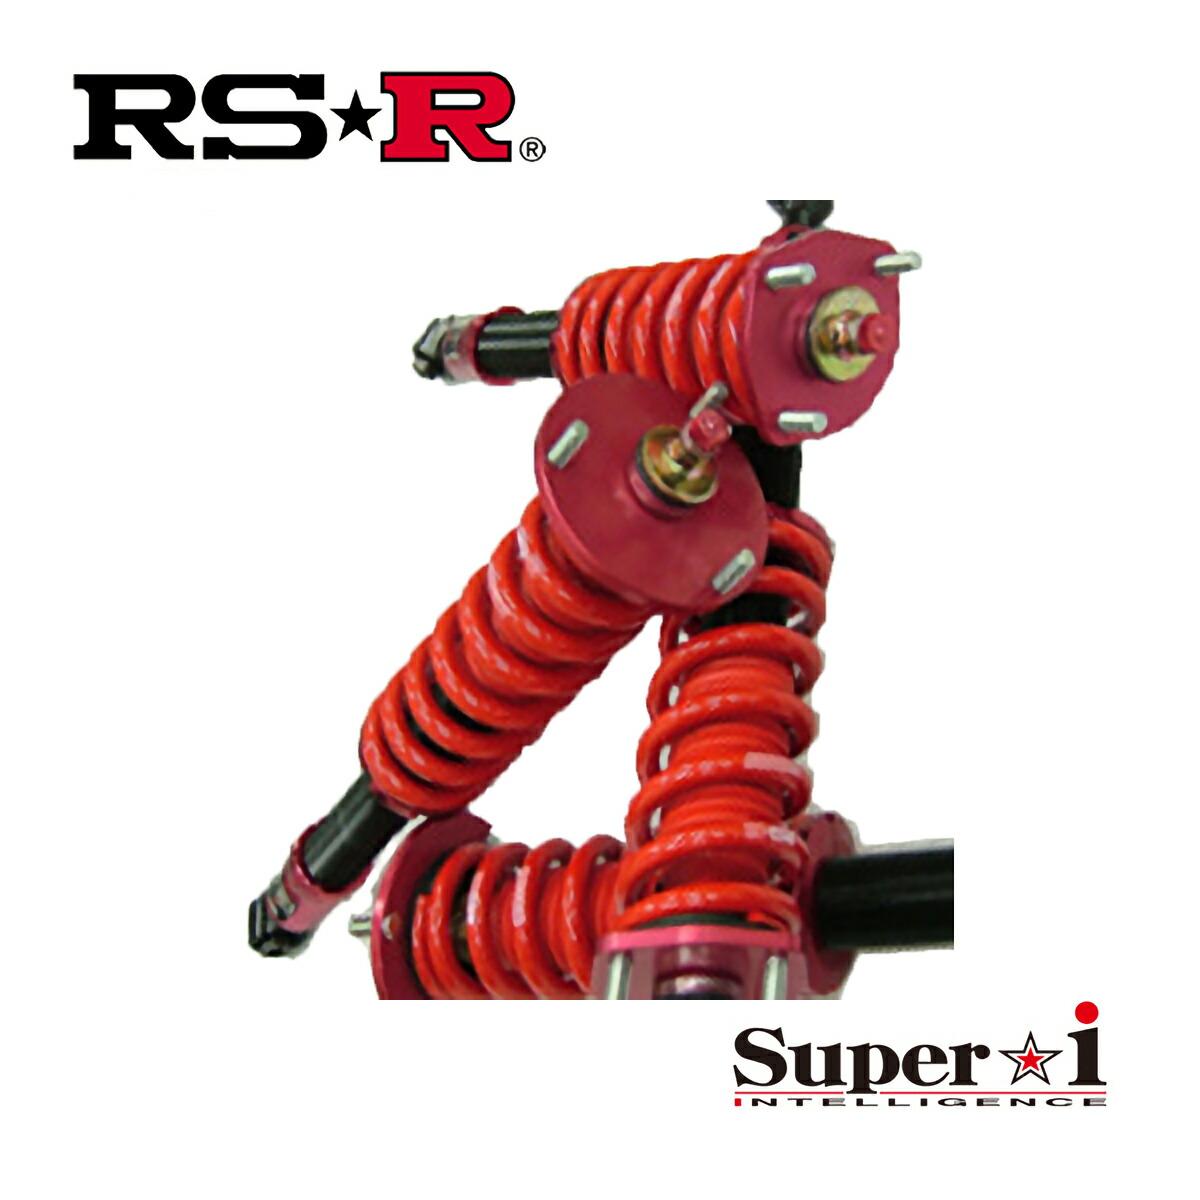 RS-R エスティマ ACR50W 車高調 推奨仕様商品コード:SIT500M ソフト仕様商品コード:SIT500S ハード仕様商品コード:SIT500H RSR 条件付き送料無料